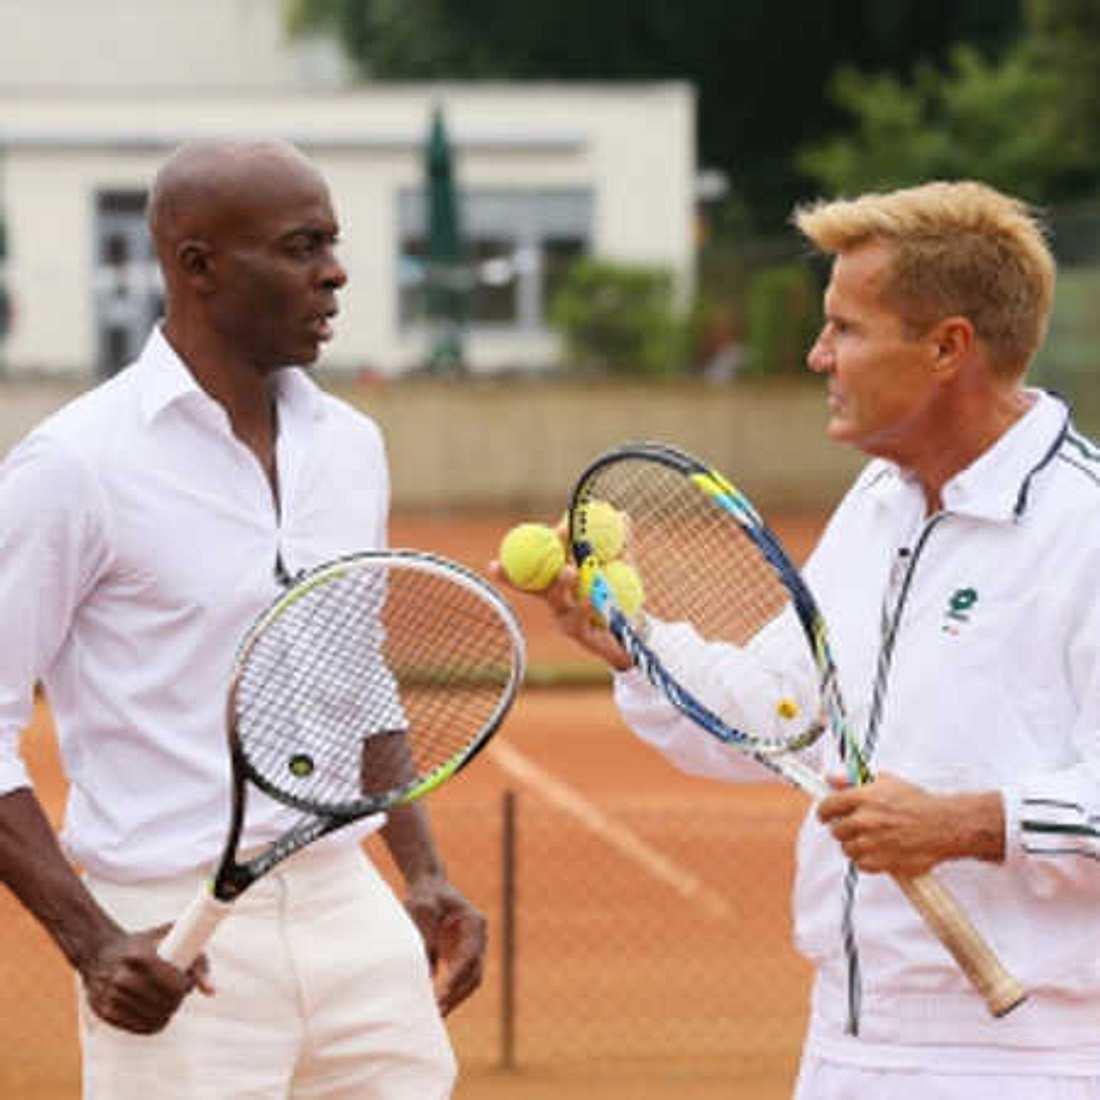 Supertalent 2014: Bruce Darnell spielt Tennis in Prada-Outfit